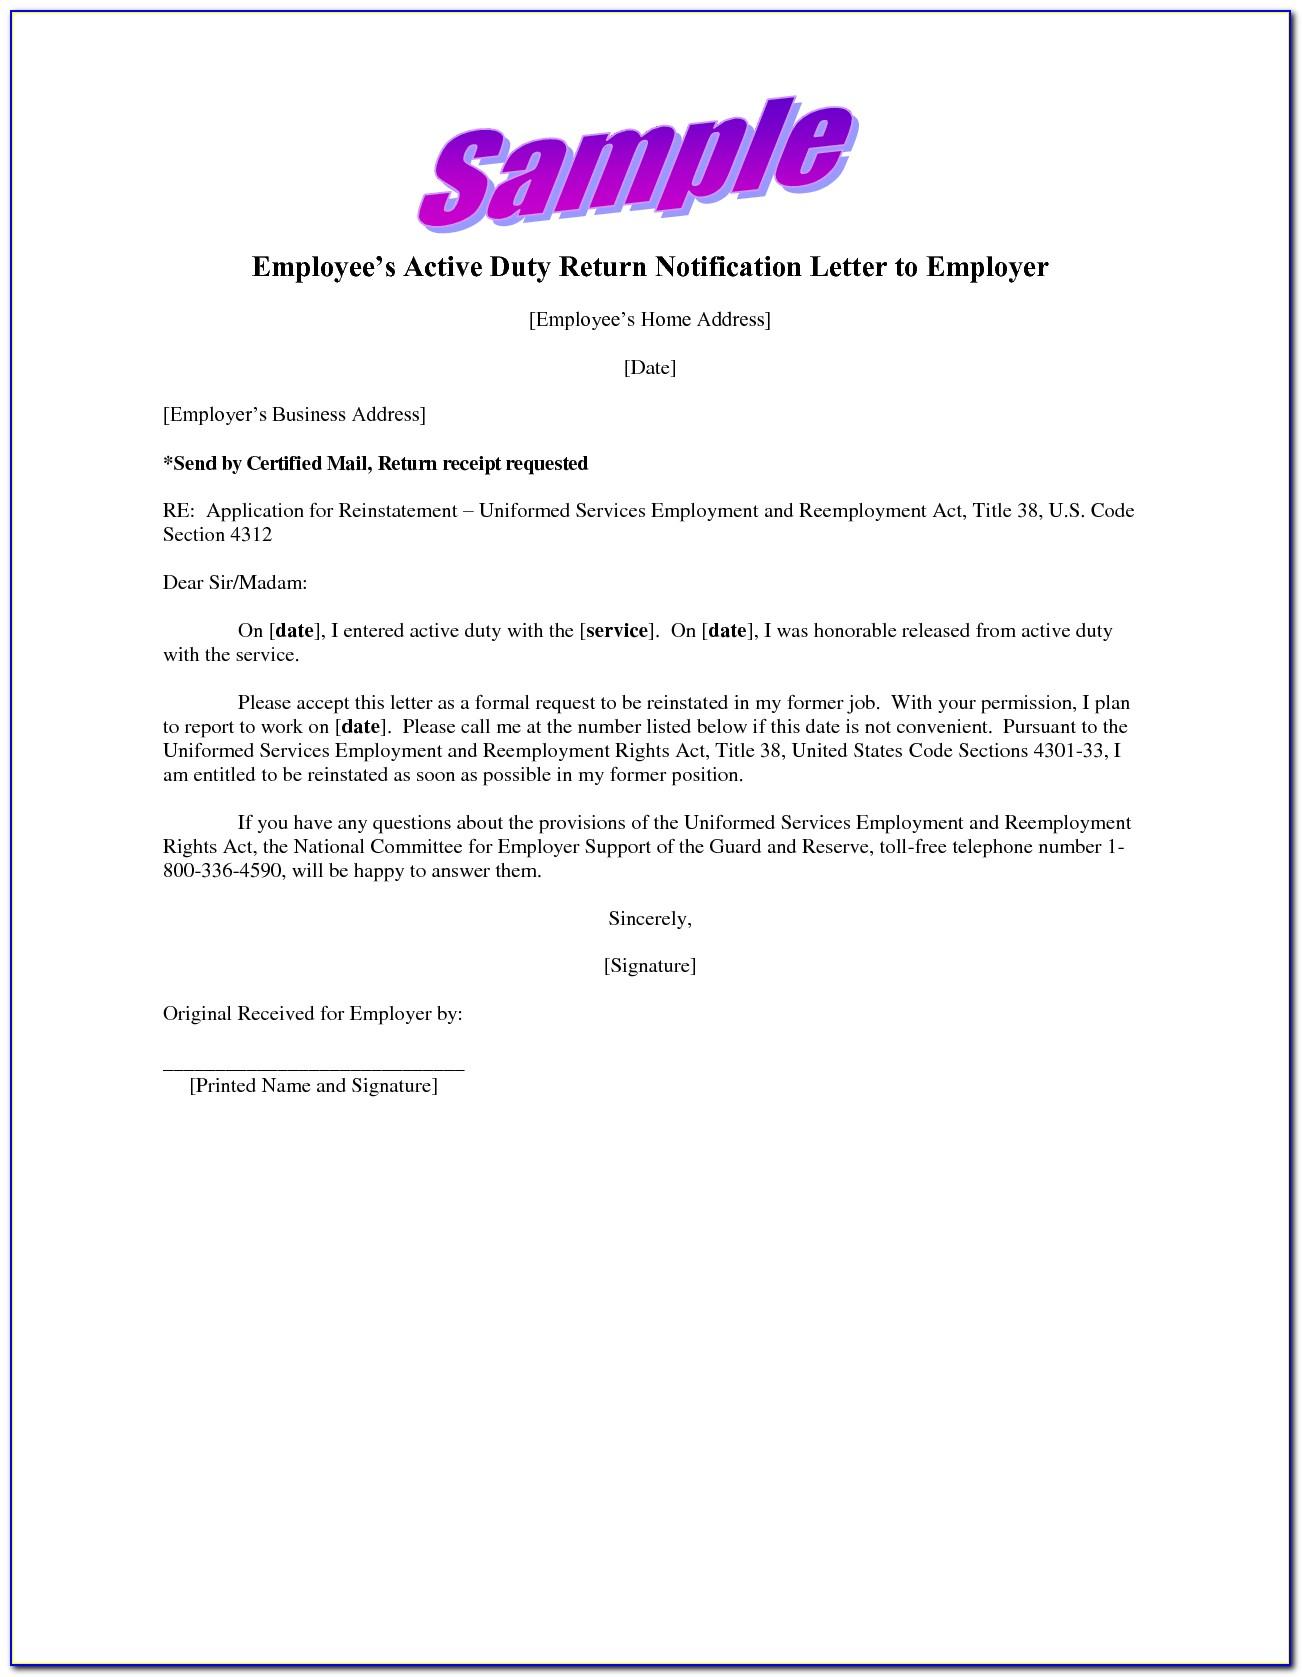 Tuskys Supermarket Job Application Form